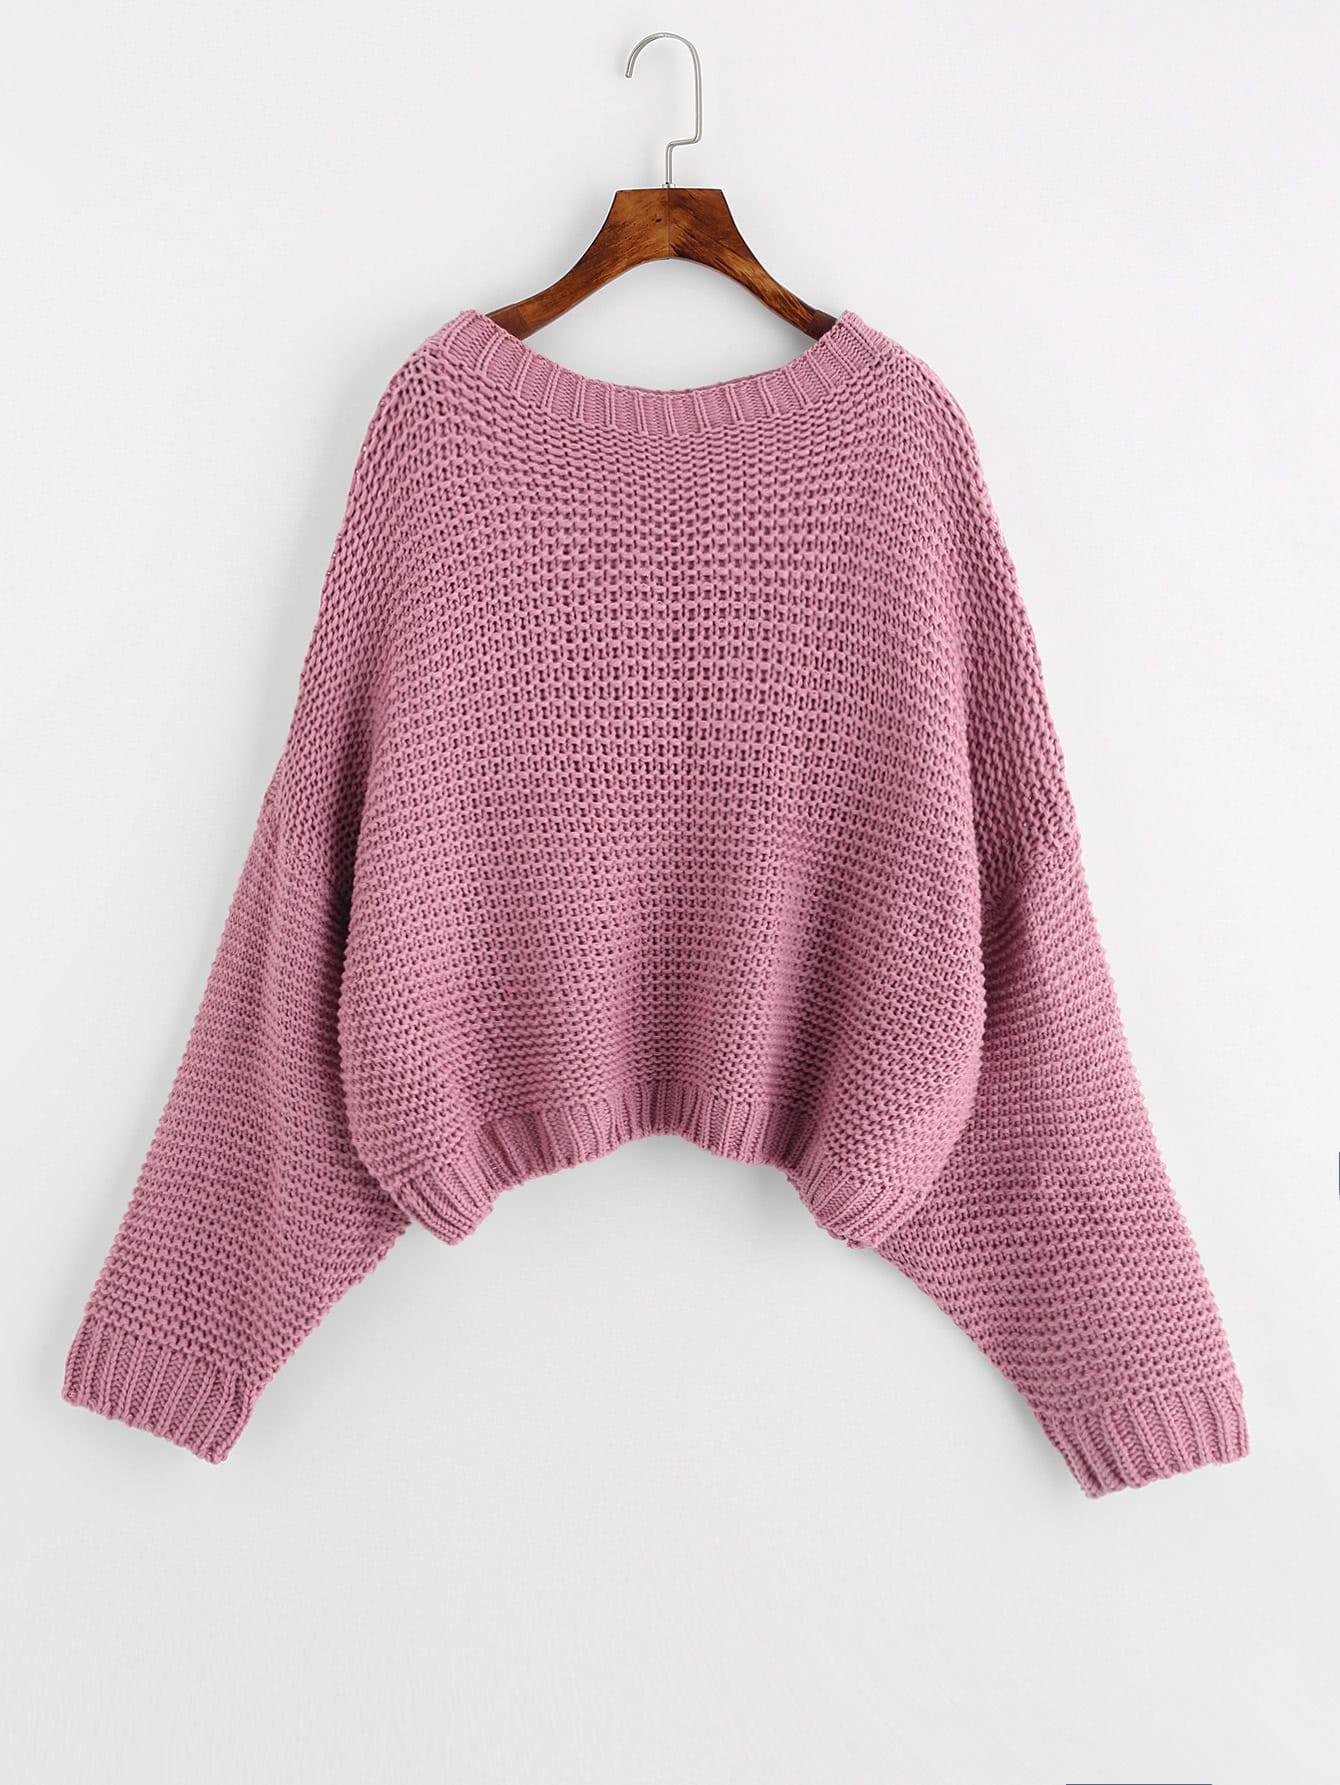 Solid Dolman Sleeve Jumper sweater170824465